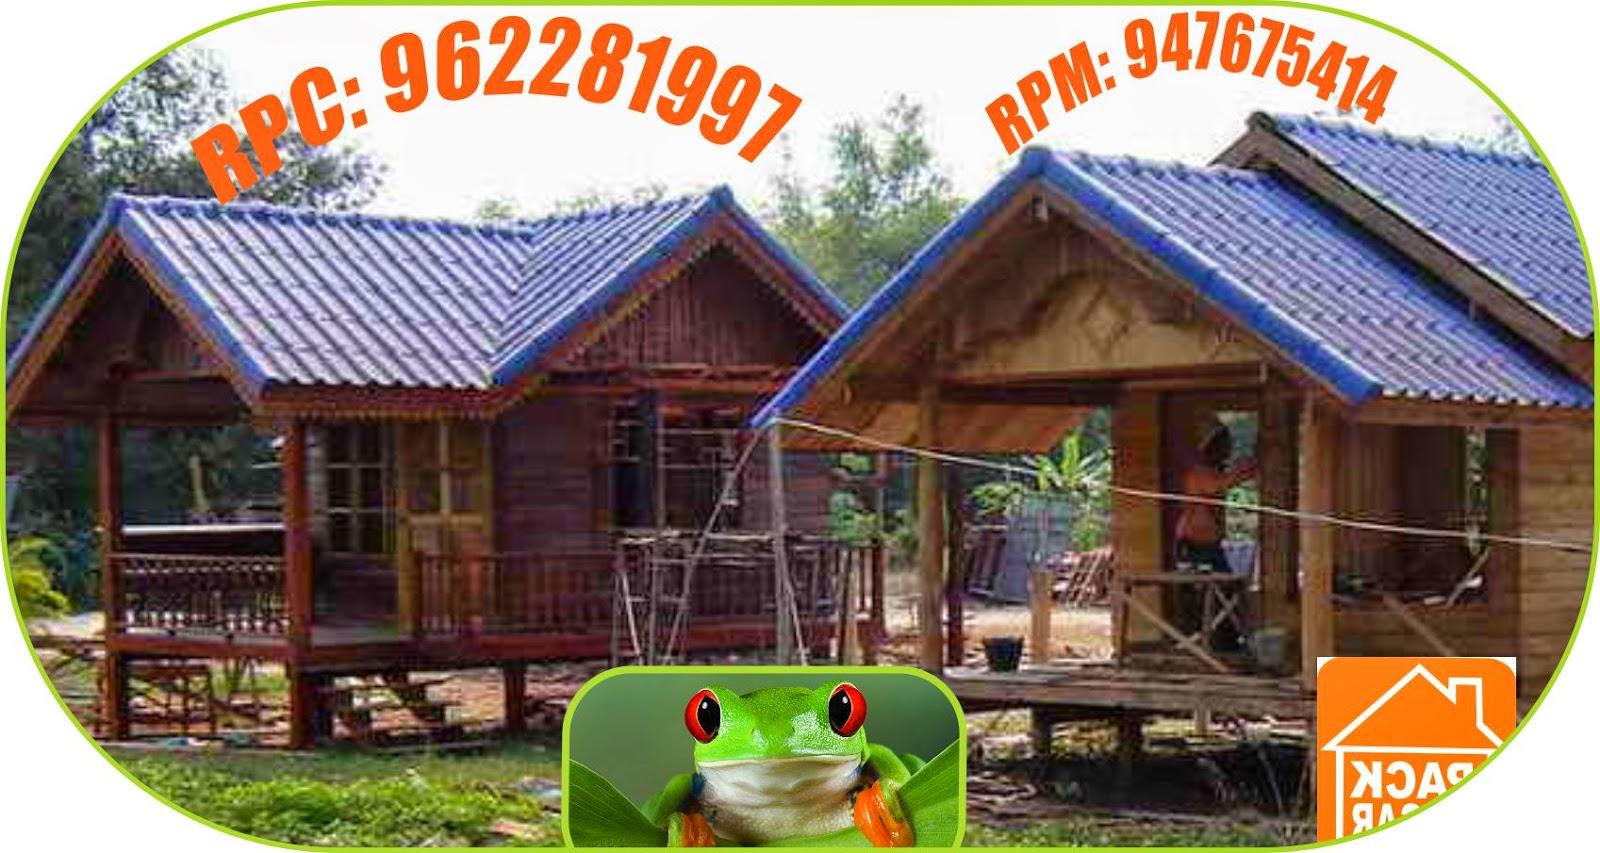 Club esparcimiento campestre bungalows caba as hotel campo - Bungalows de madera prefabricadas precios ...